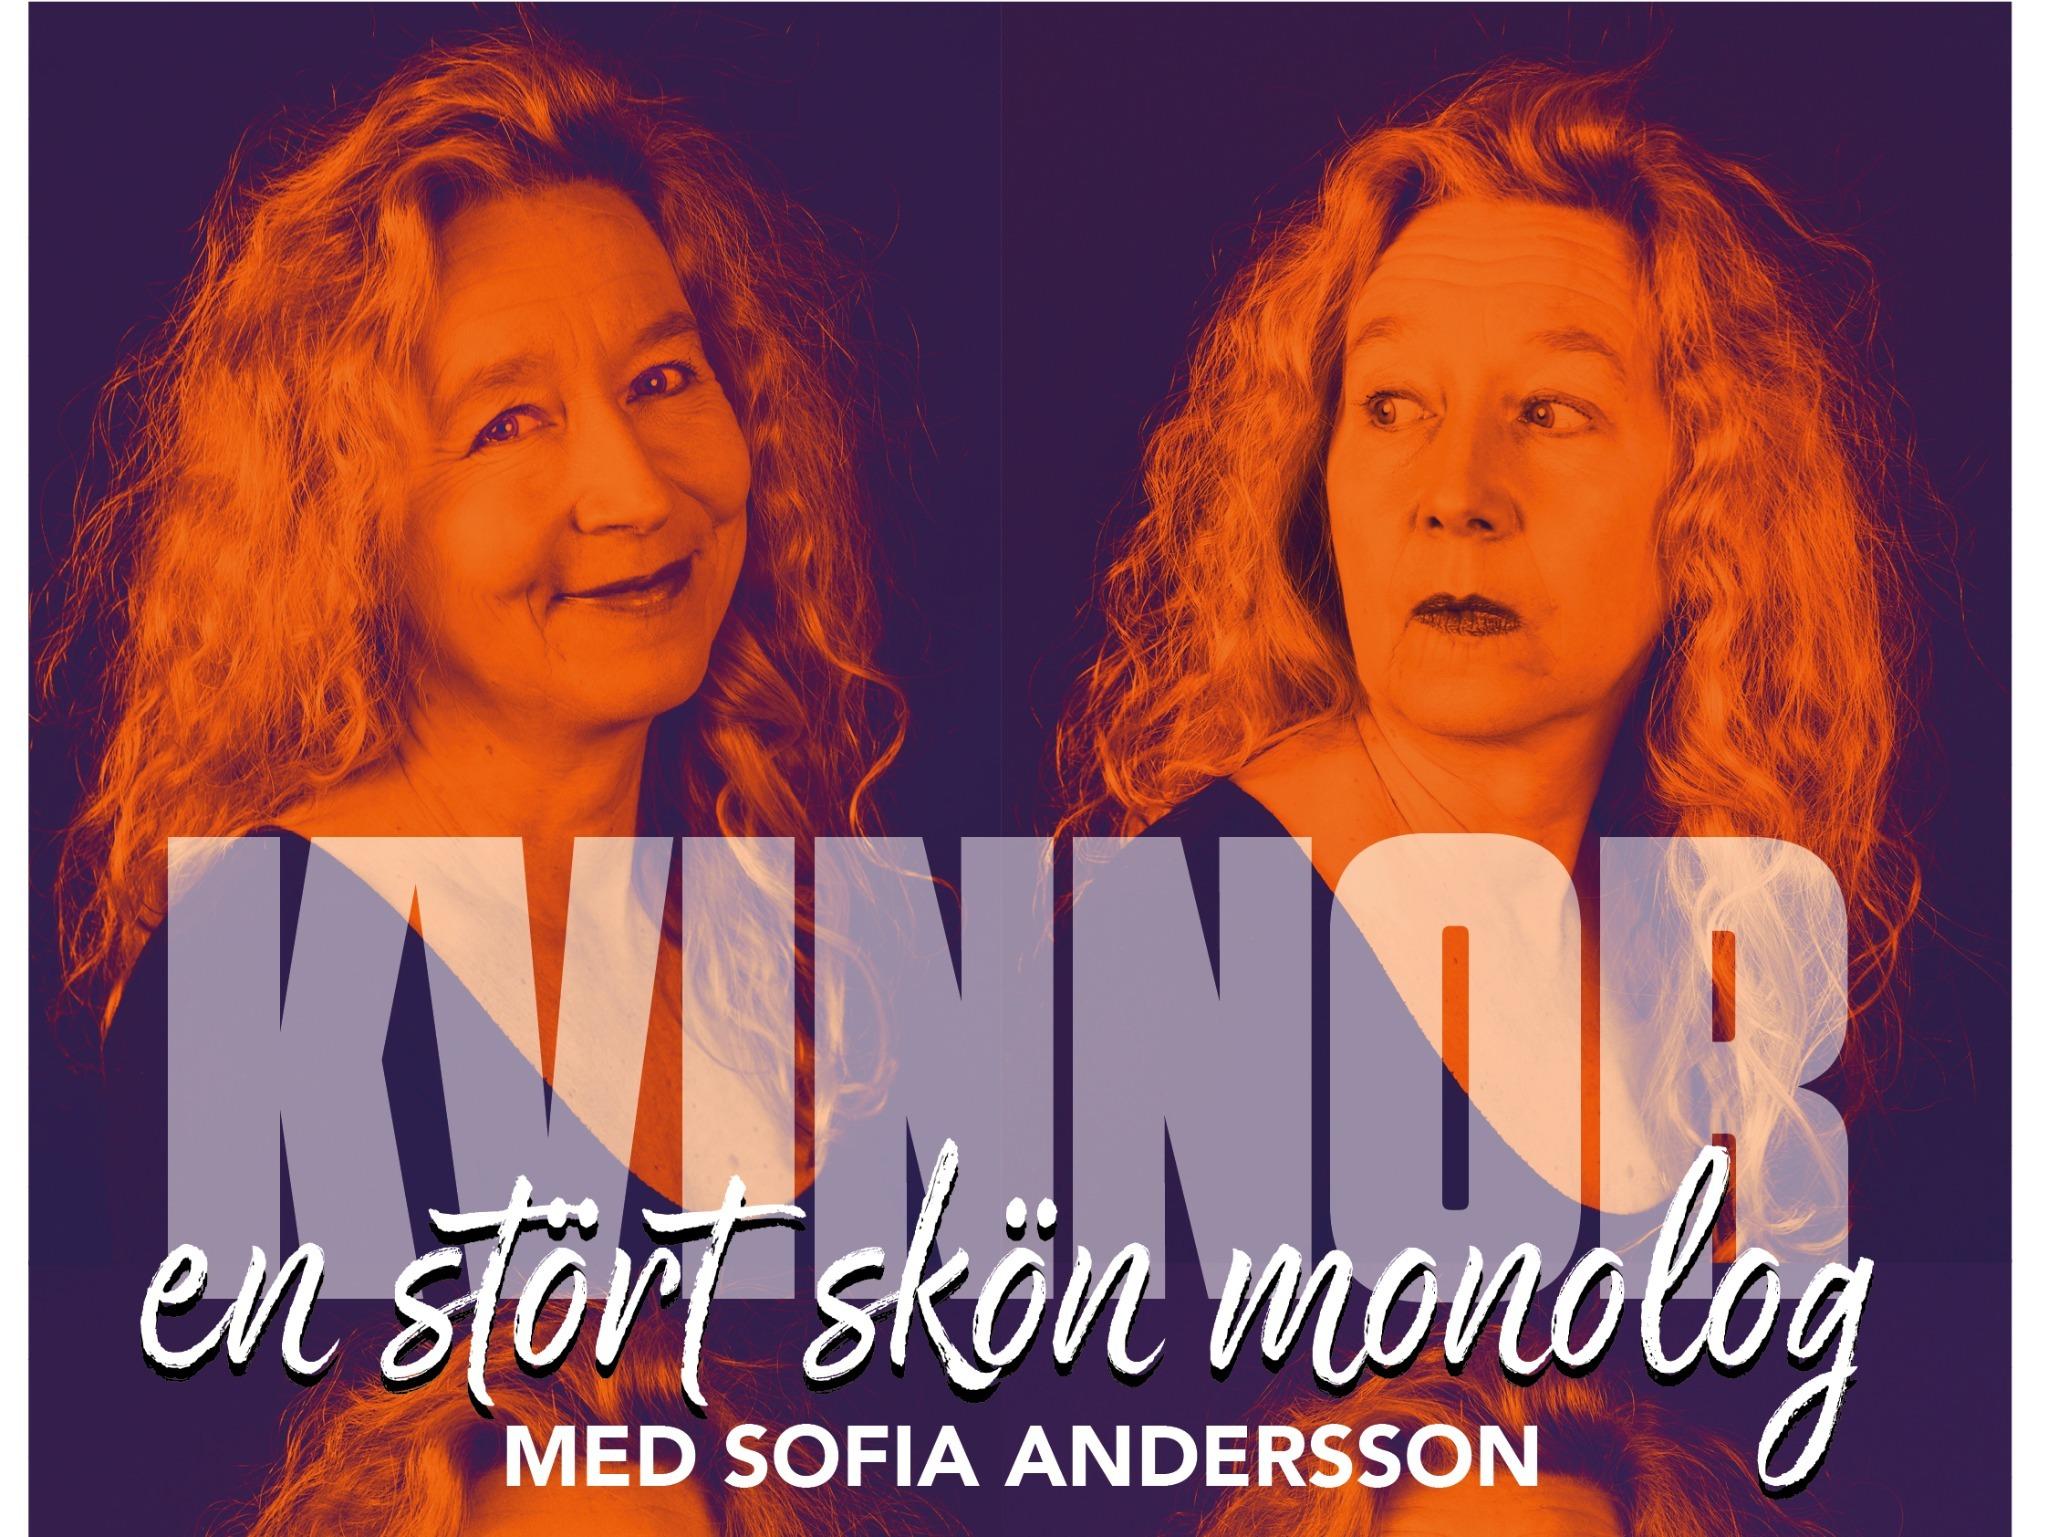 Kvinnor monolog